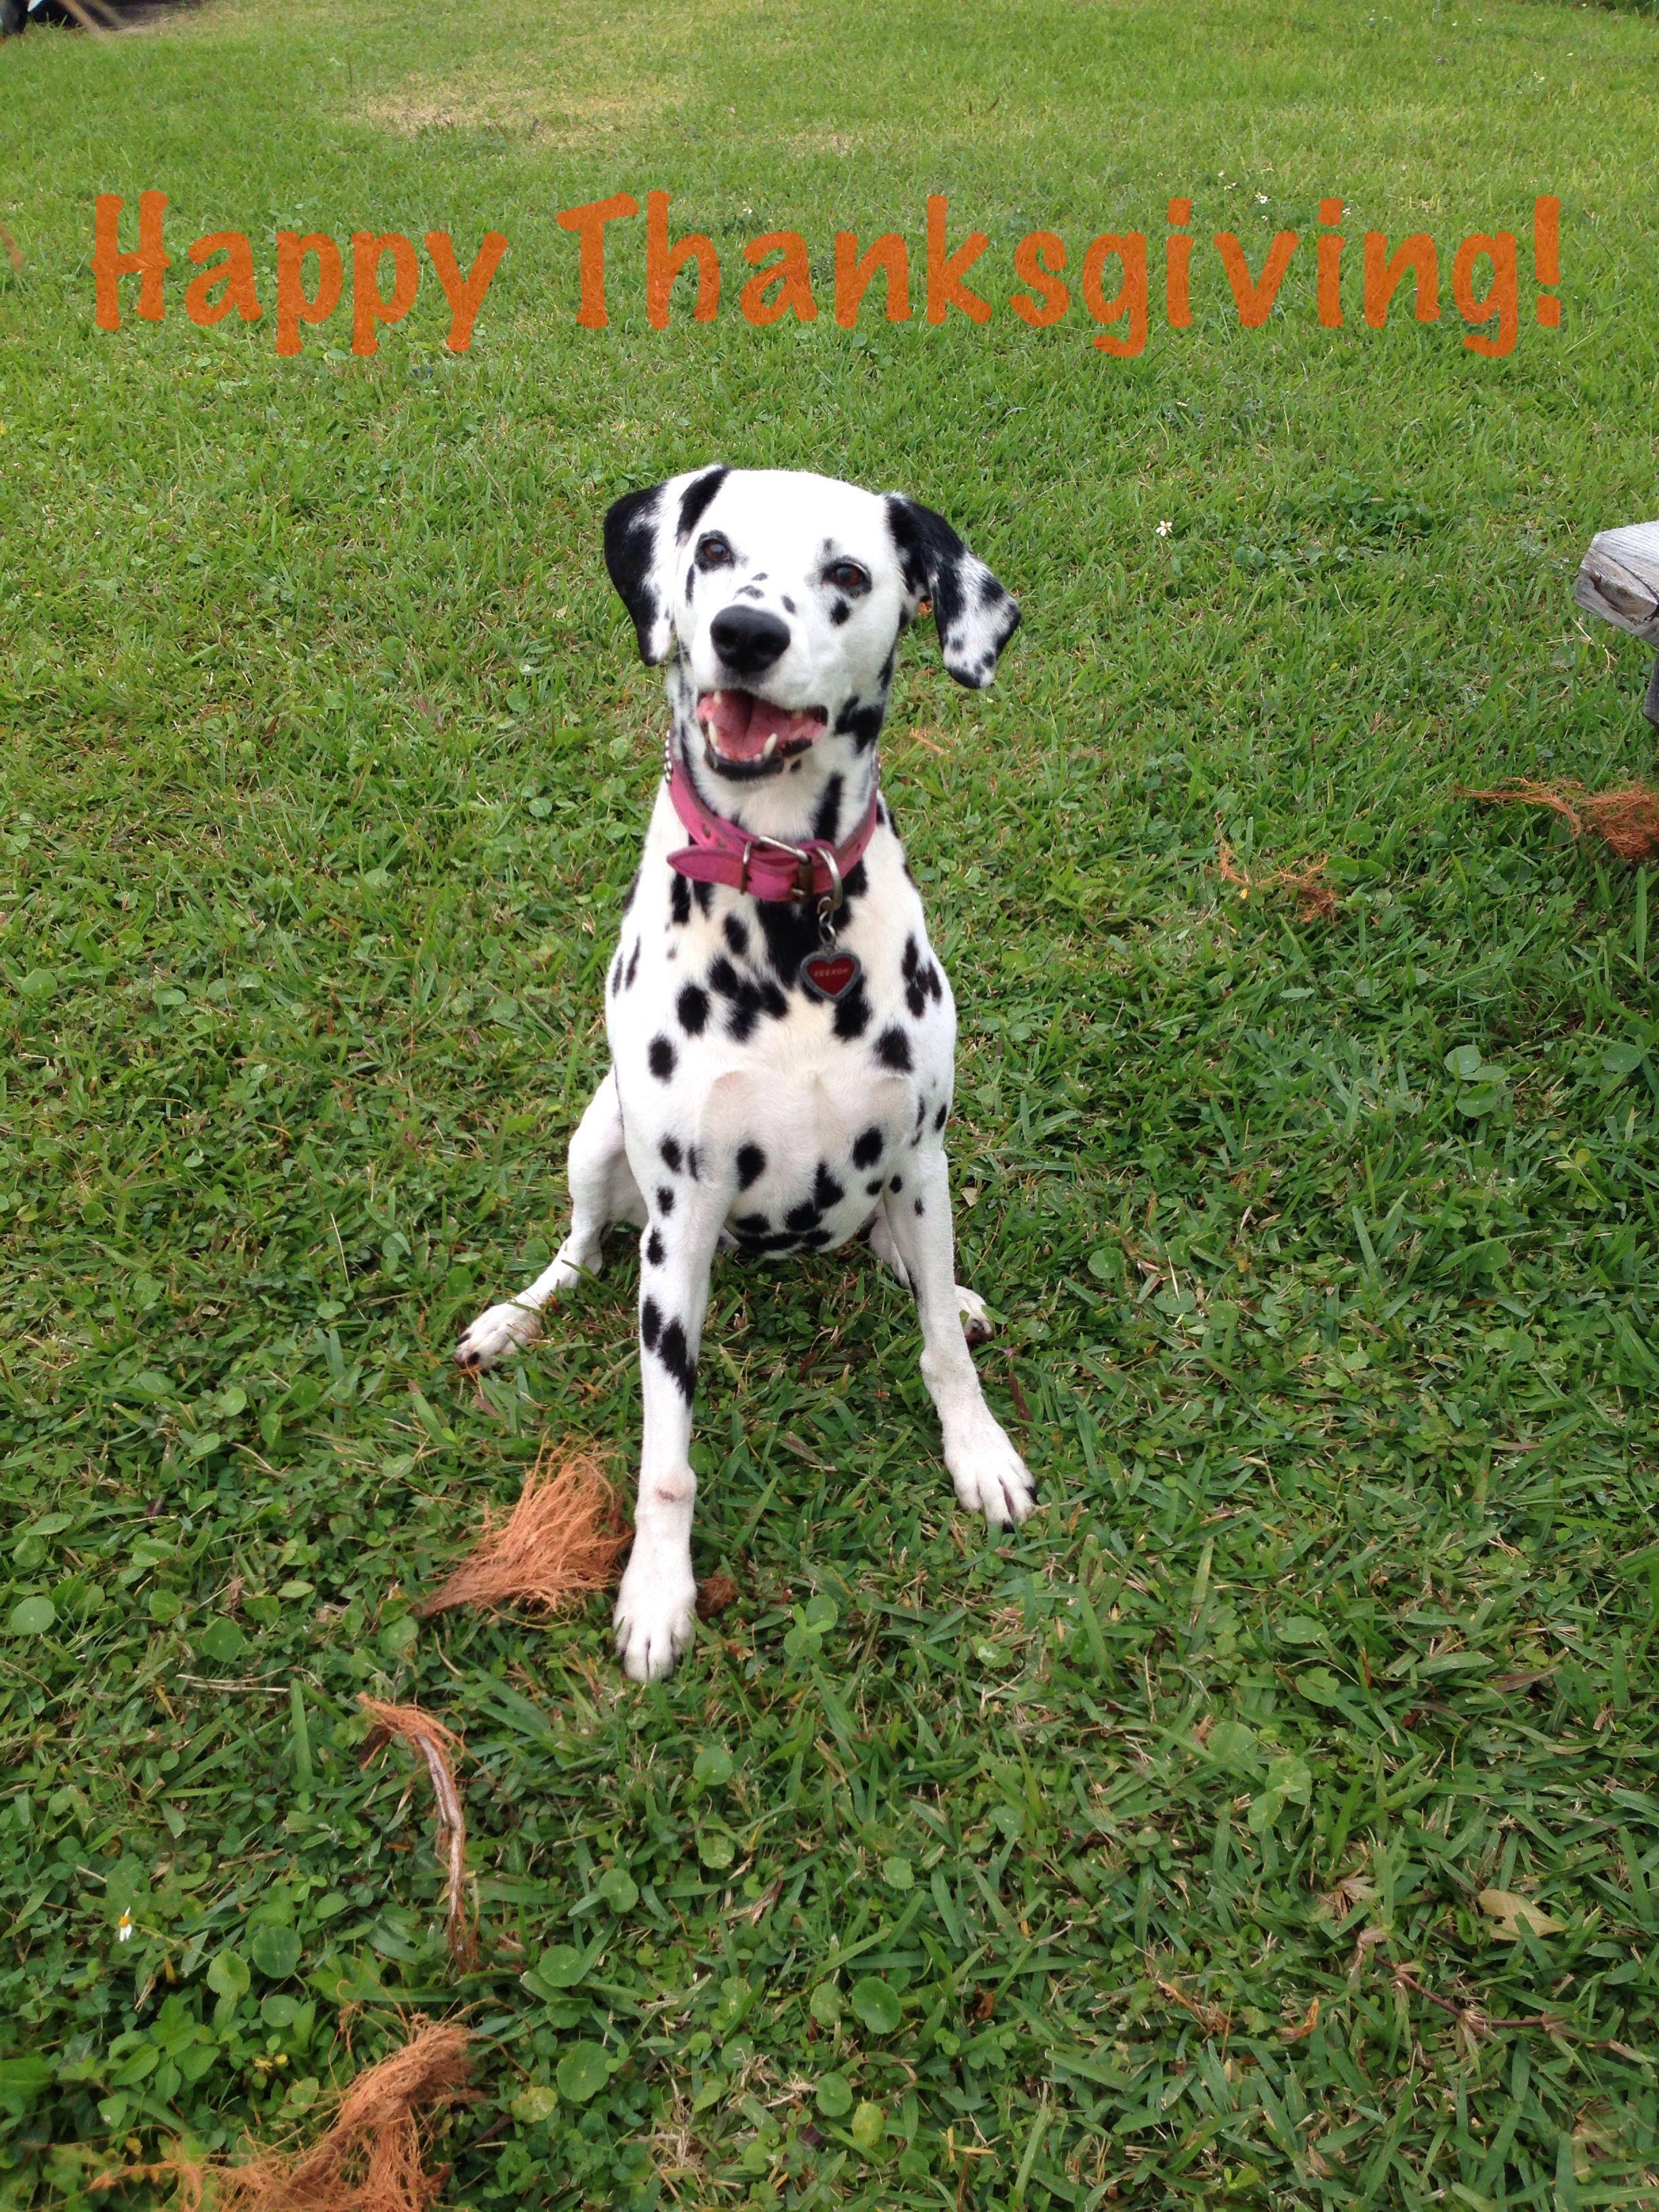 Happy Thanksgiving Dalmatian Keekoh Caza | Dalmatian | Pinterest ...